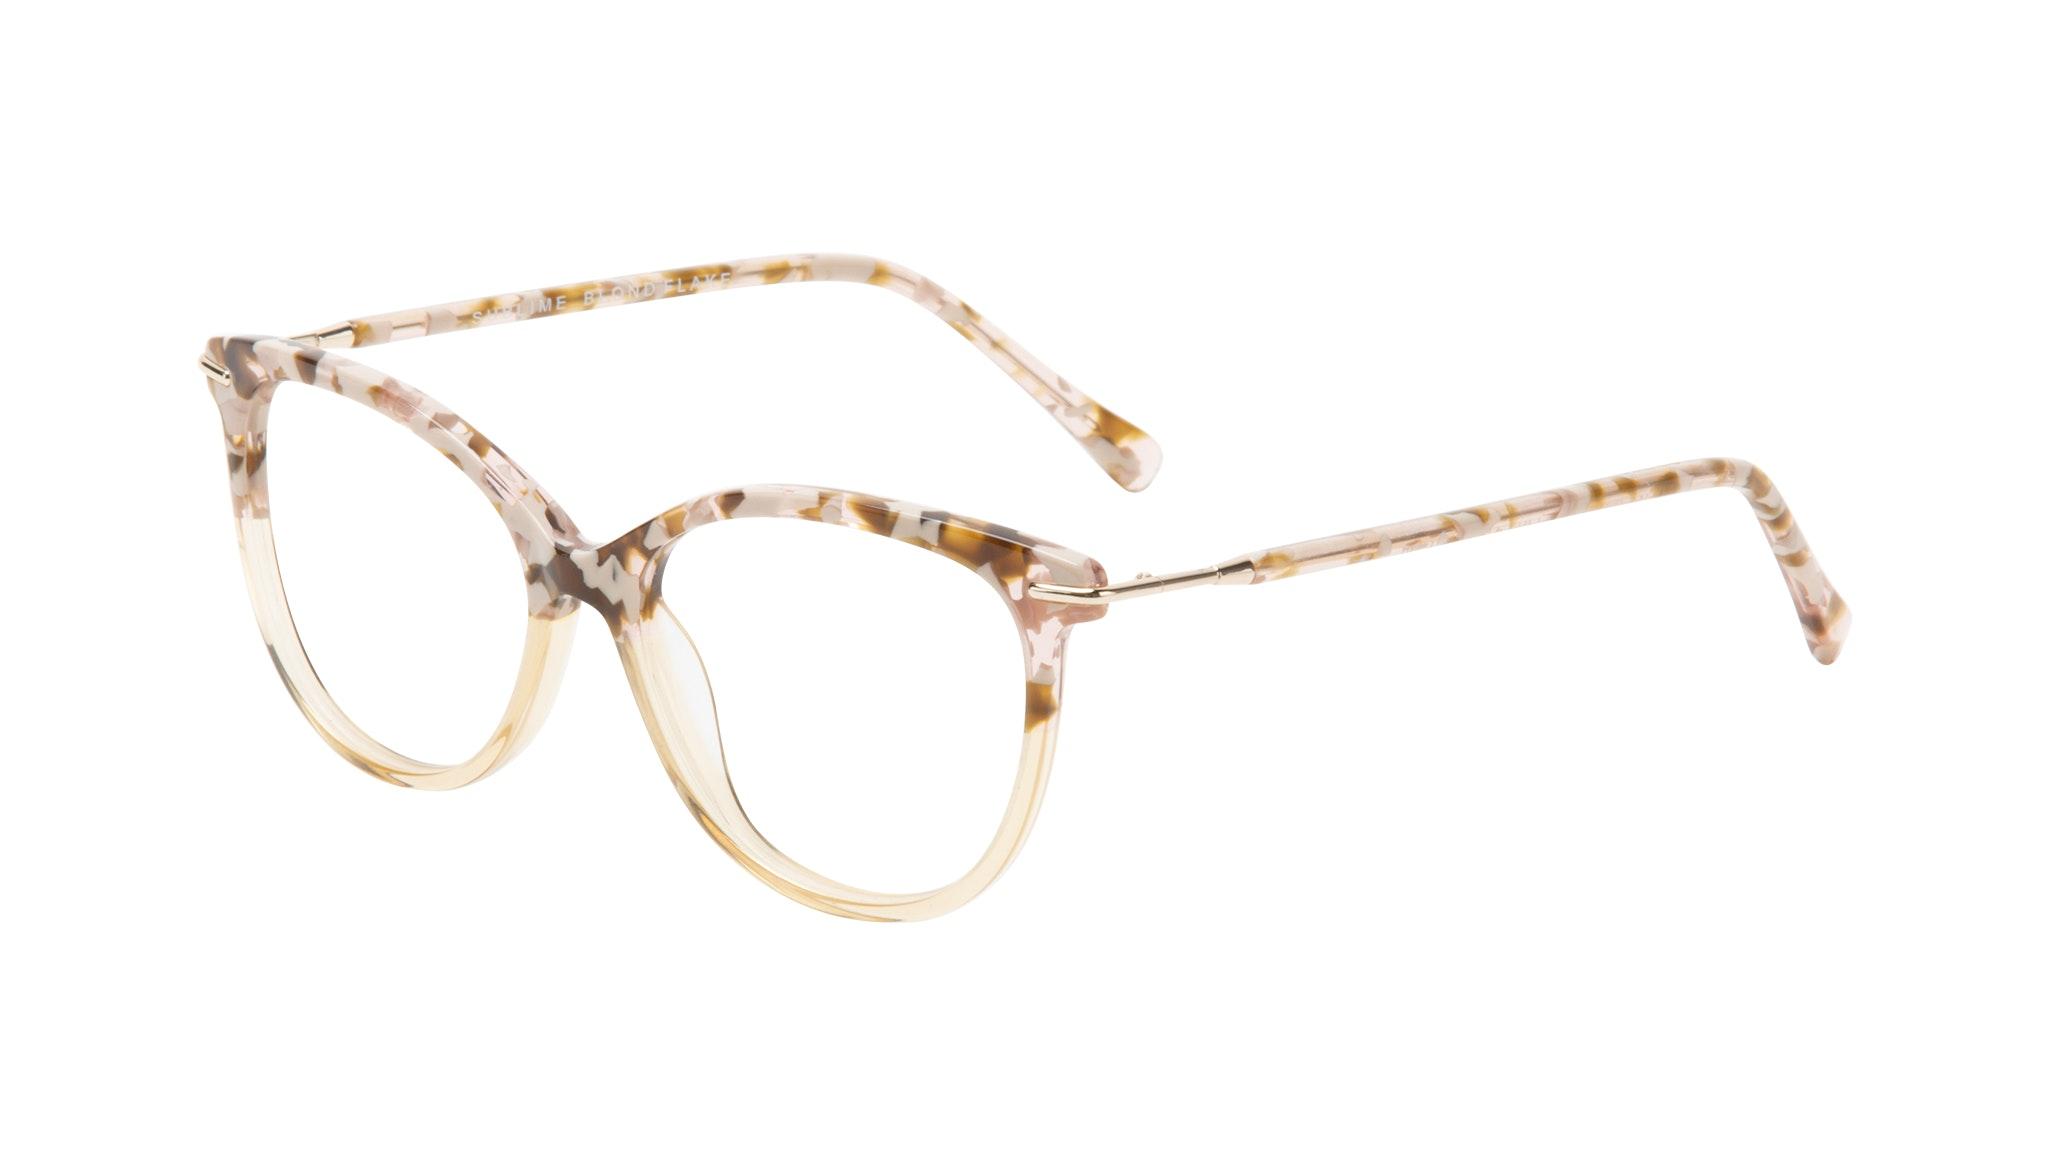 Affordable Fashion Glasses Round Eyeglasses Women Sublime Blond Flake Tilt